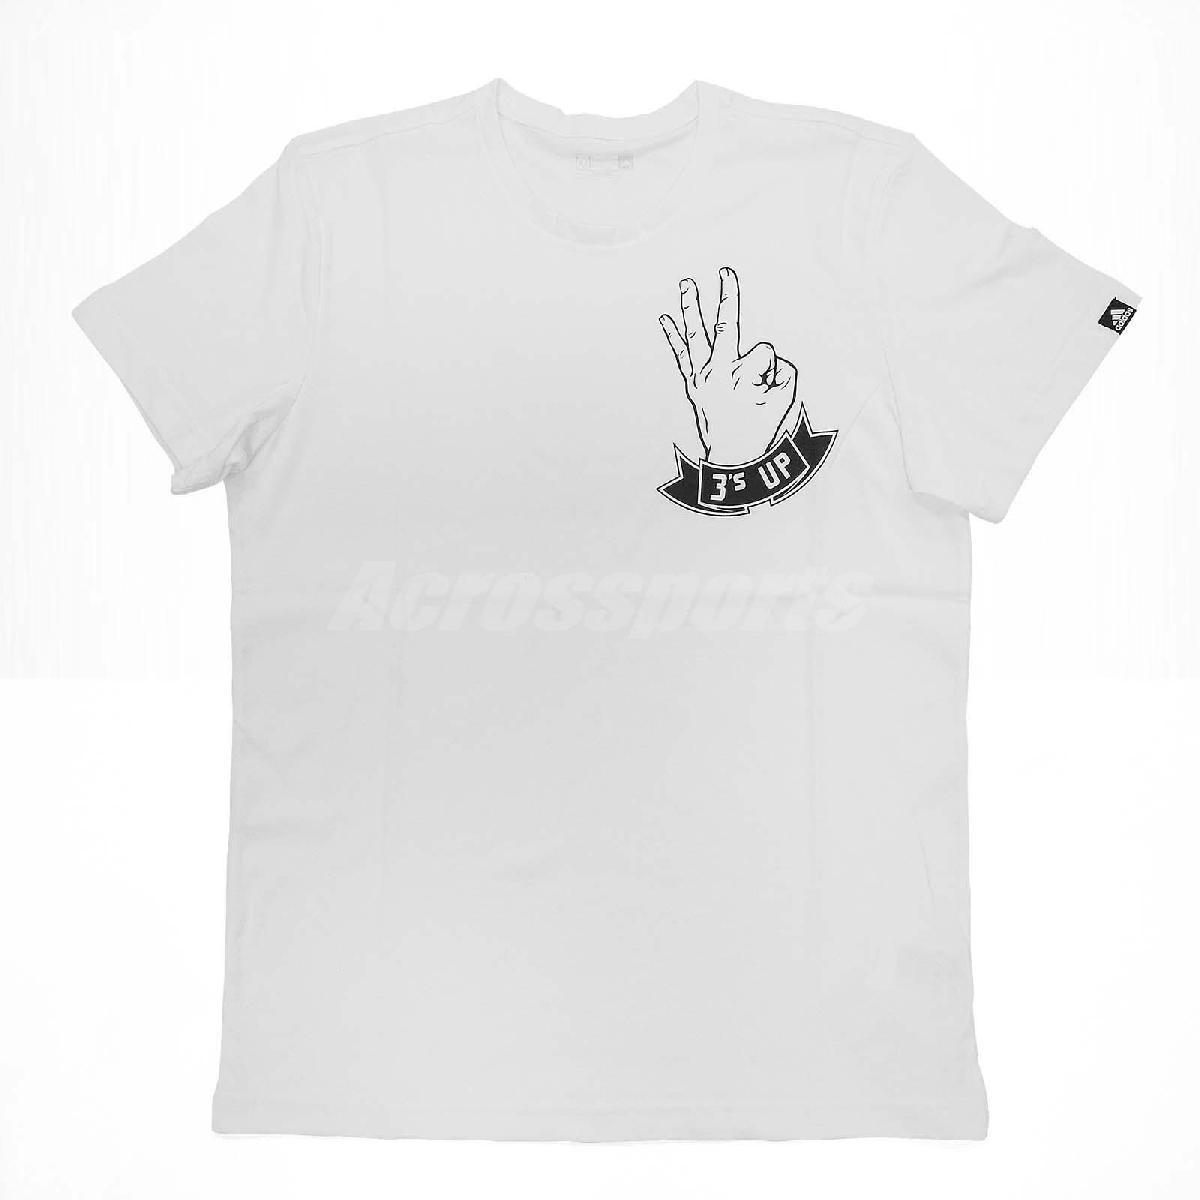 adidas T恤3s Up Hand白黑短袖上衣男款T-Shirt Tee PUMP306 S97175